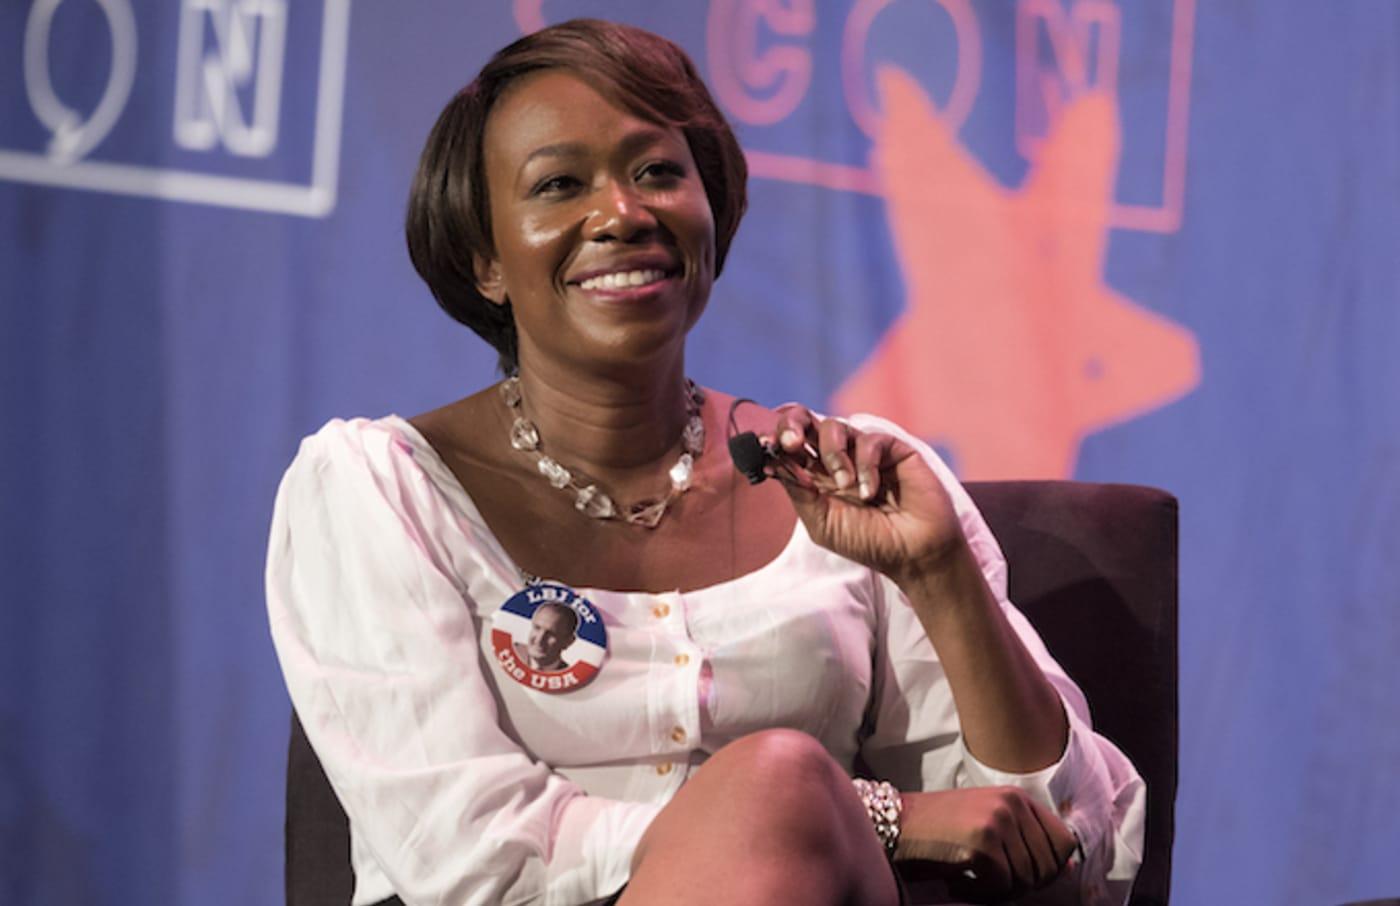 Joy Ann Reid speaks during Politicon at the Pasadena Convention Center in Pasadena, California.